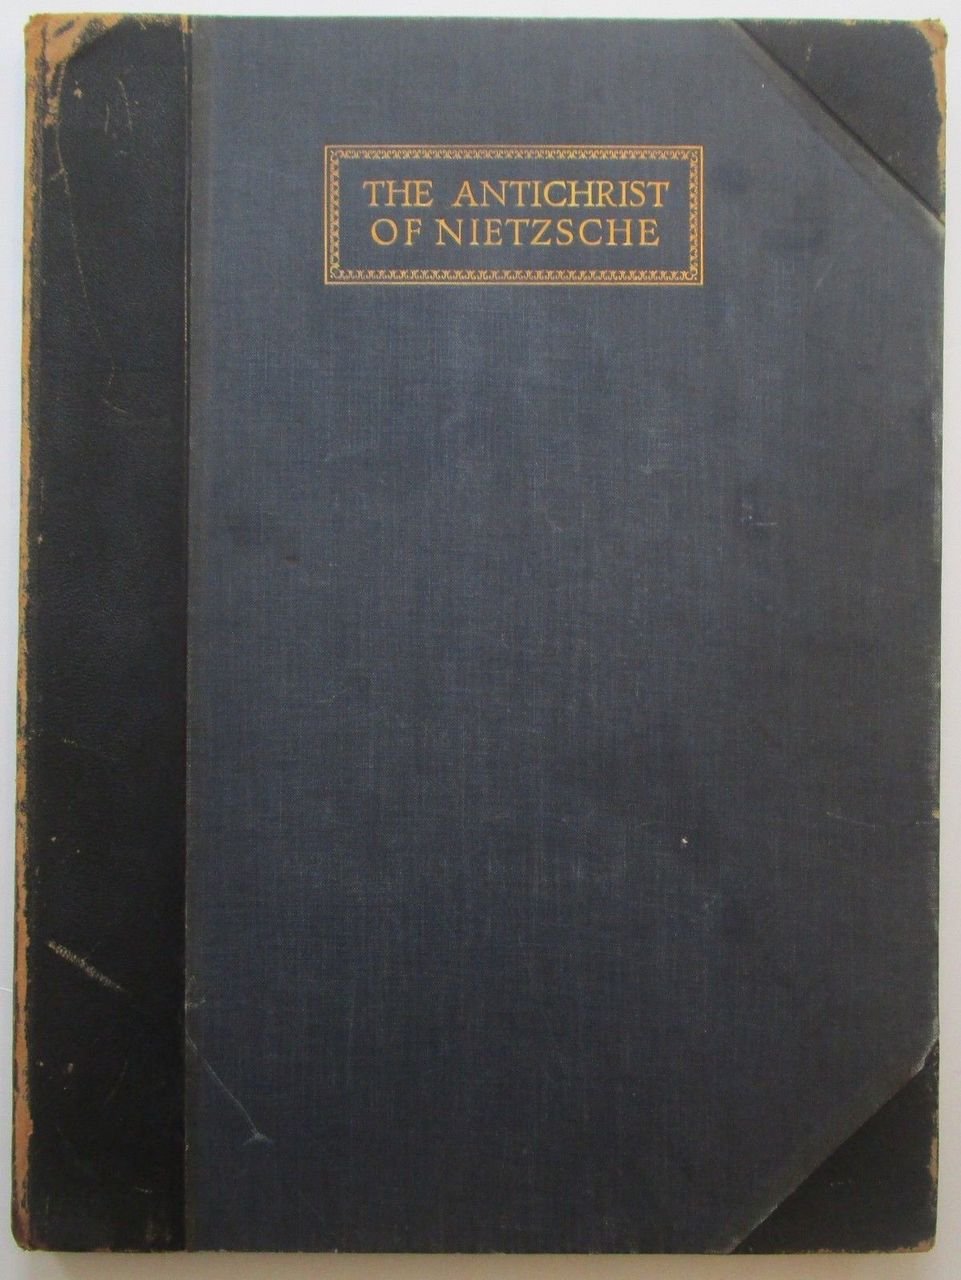 THE ANTICHRIST OF NIETZSCHE, by Friedrich Nietzsche; w/Norman Lindsay - 1928 [53/550]